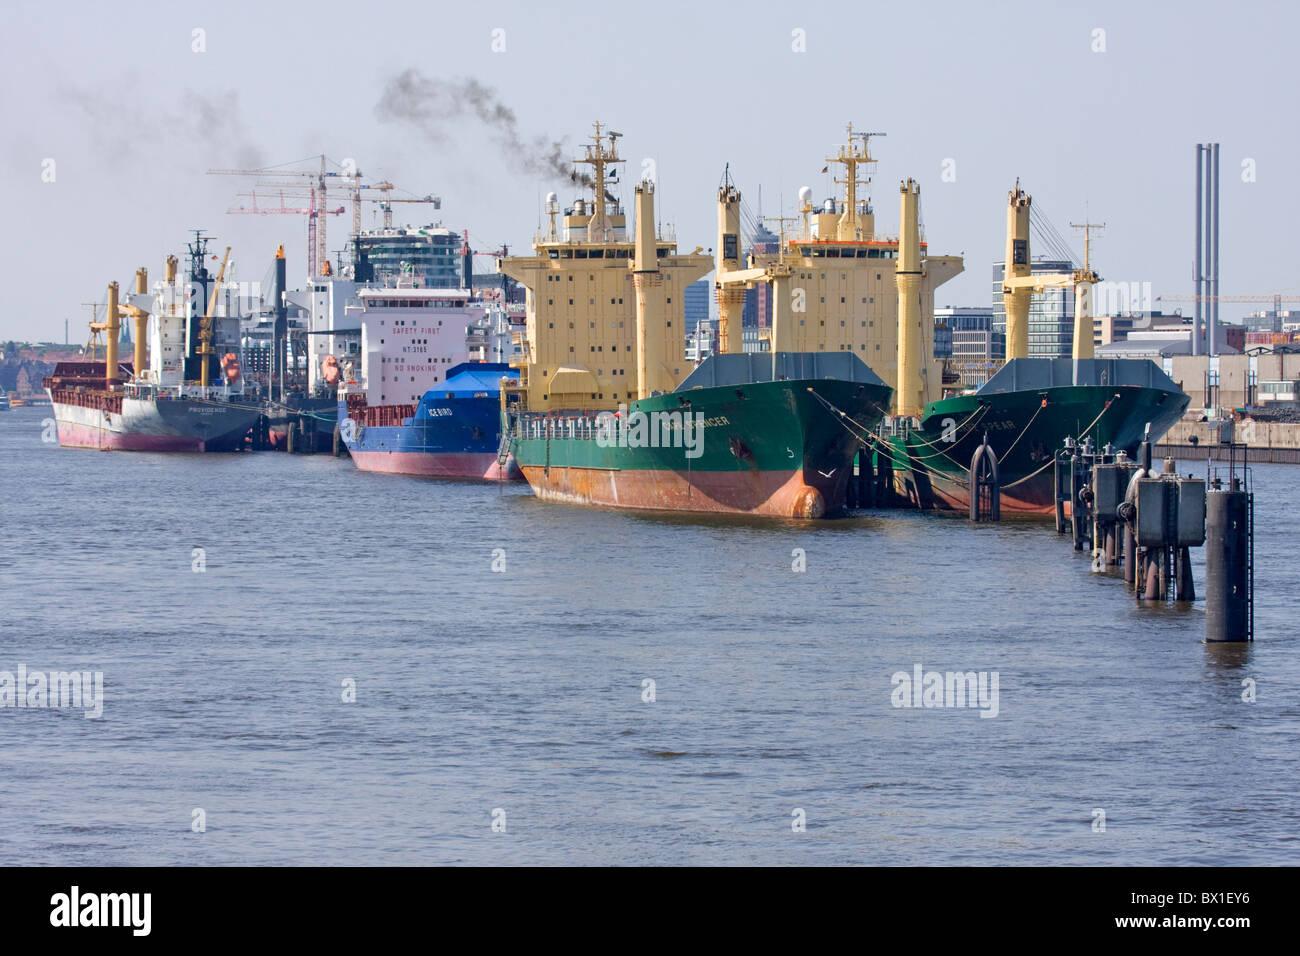 Economical crisis at Hamburg harbor, Germany - Stock Image